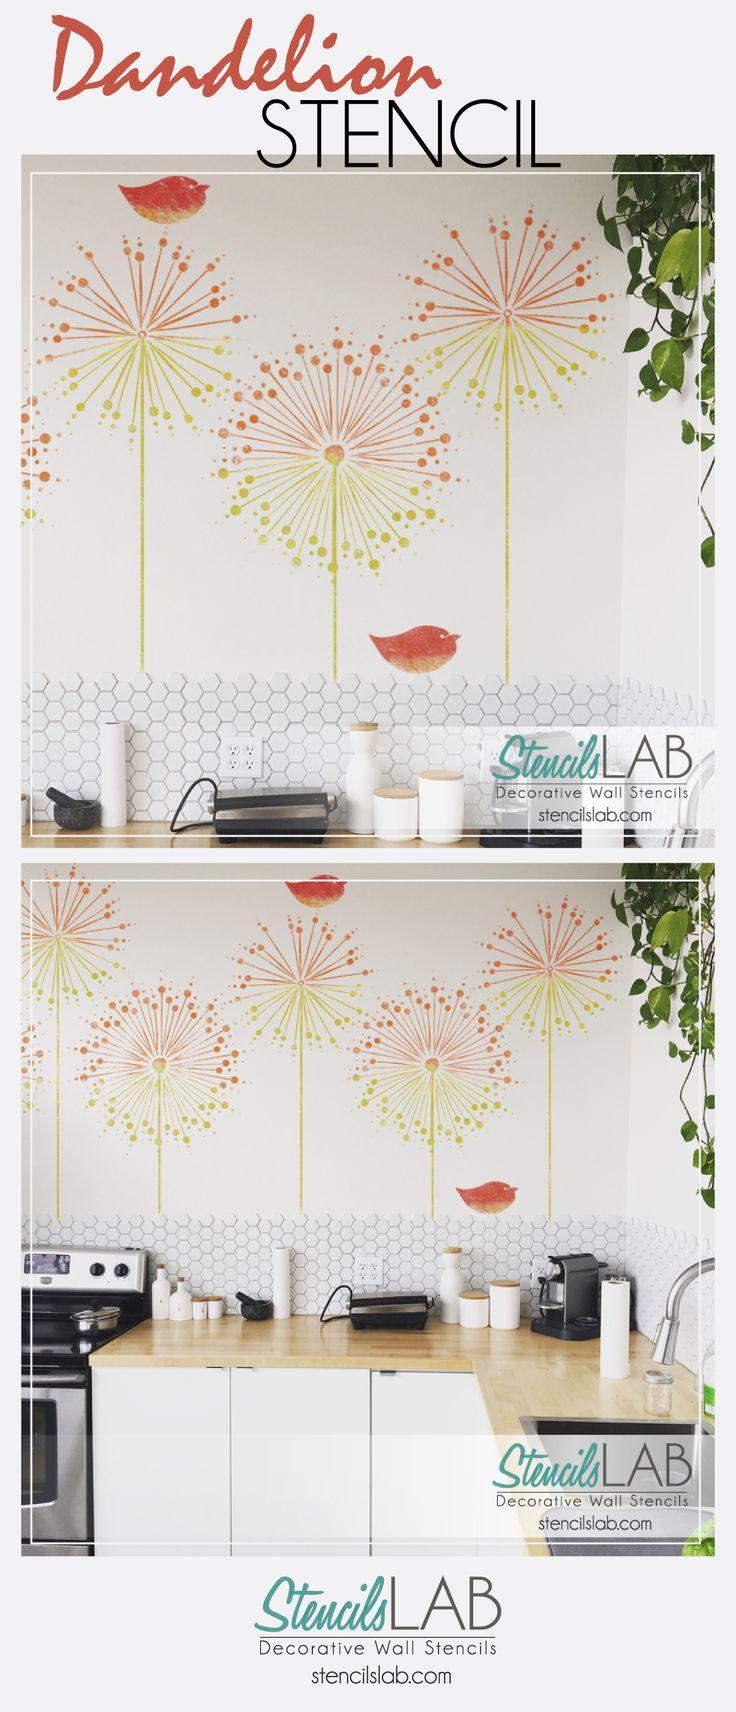 25 unique flower stencils ideas on pinterest flower silhouette dandelion wall stencil floral wall stencils dandelion bird stencil amipublicfo Choice Image